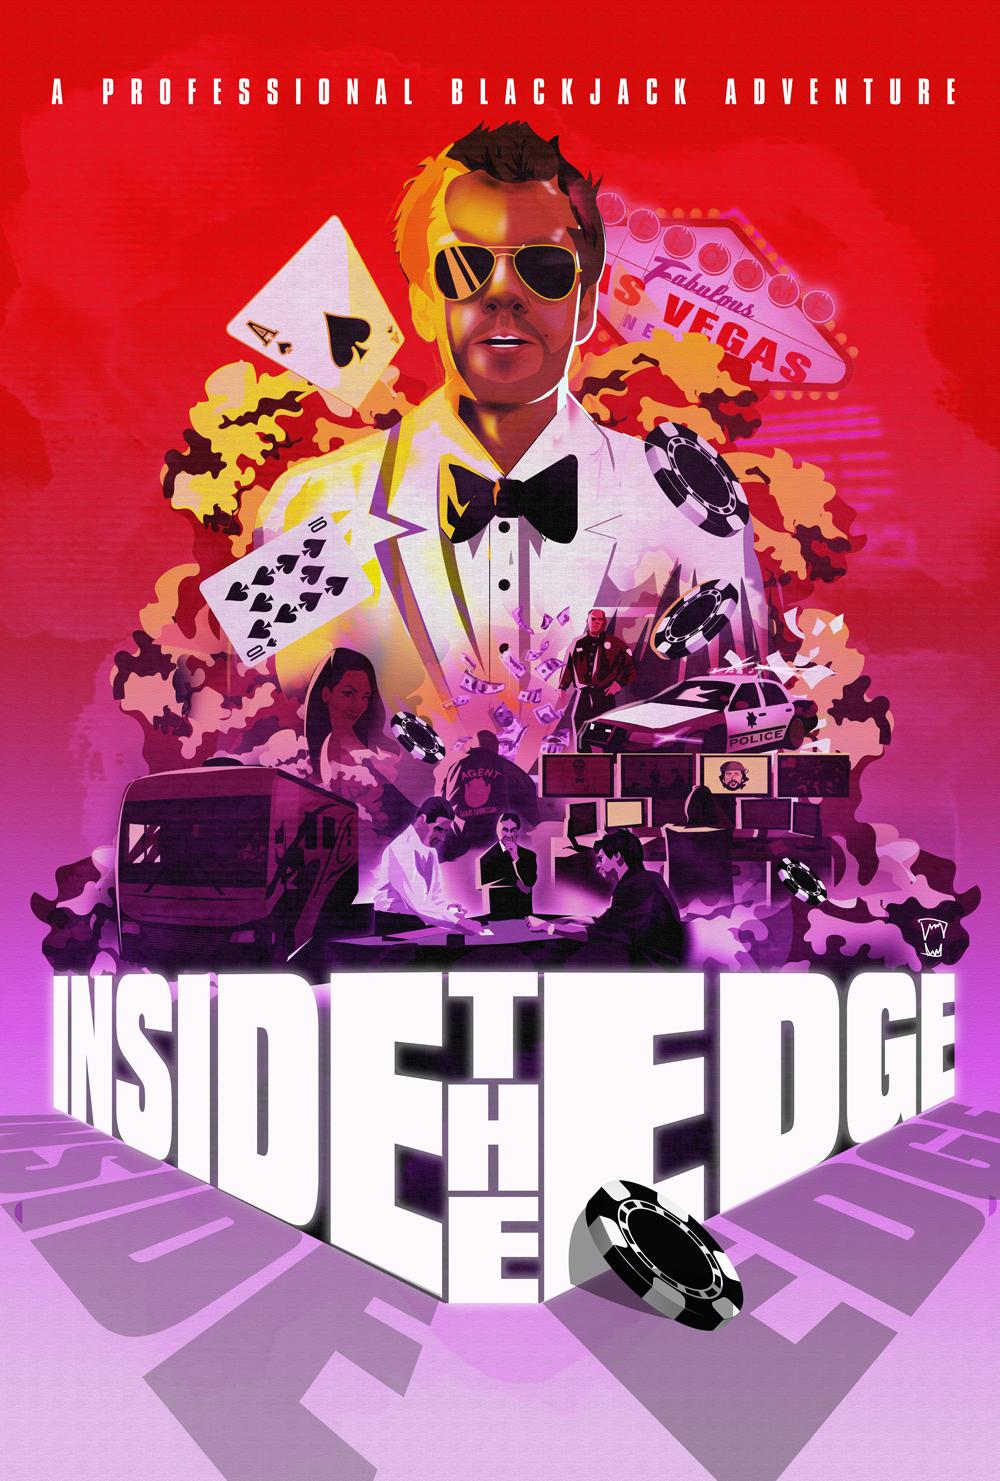 Inside the edge blackjack poker angle shooting